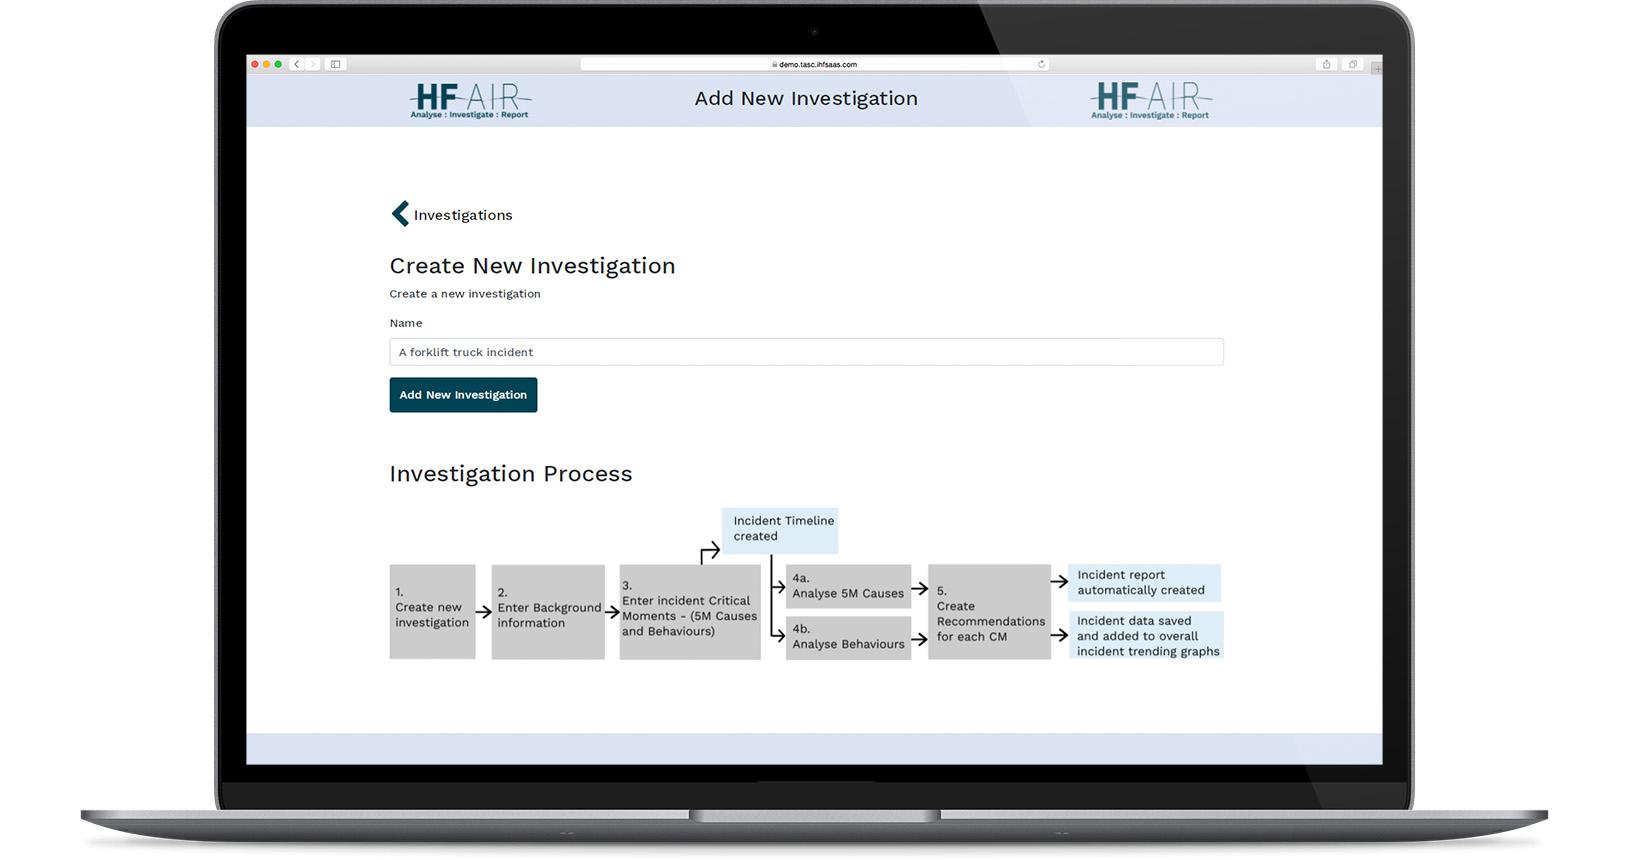 HF-AIR-incident-investigation